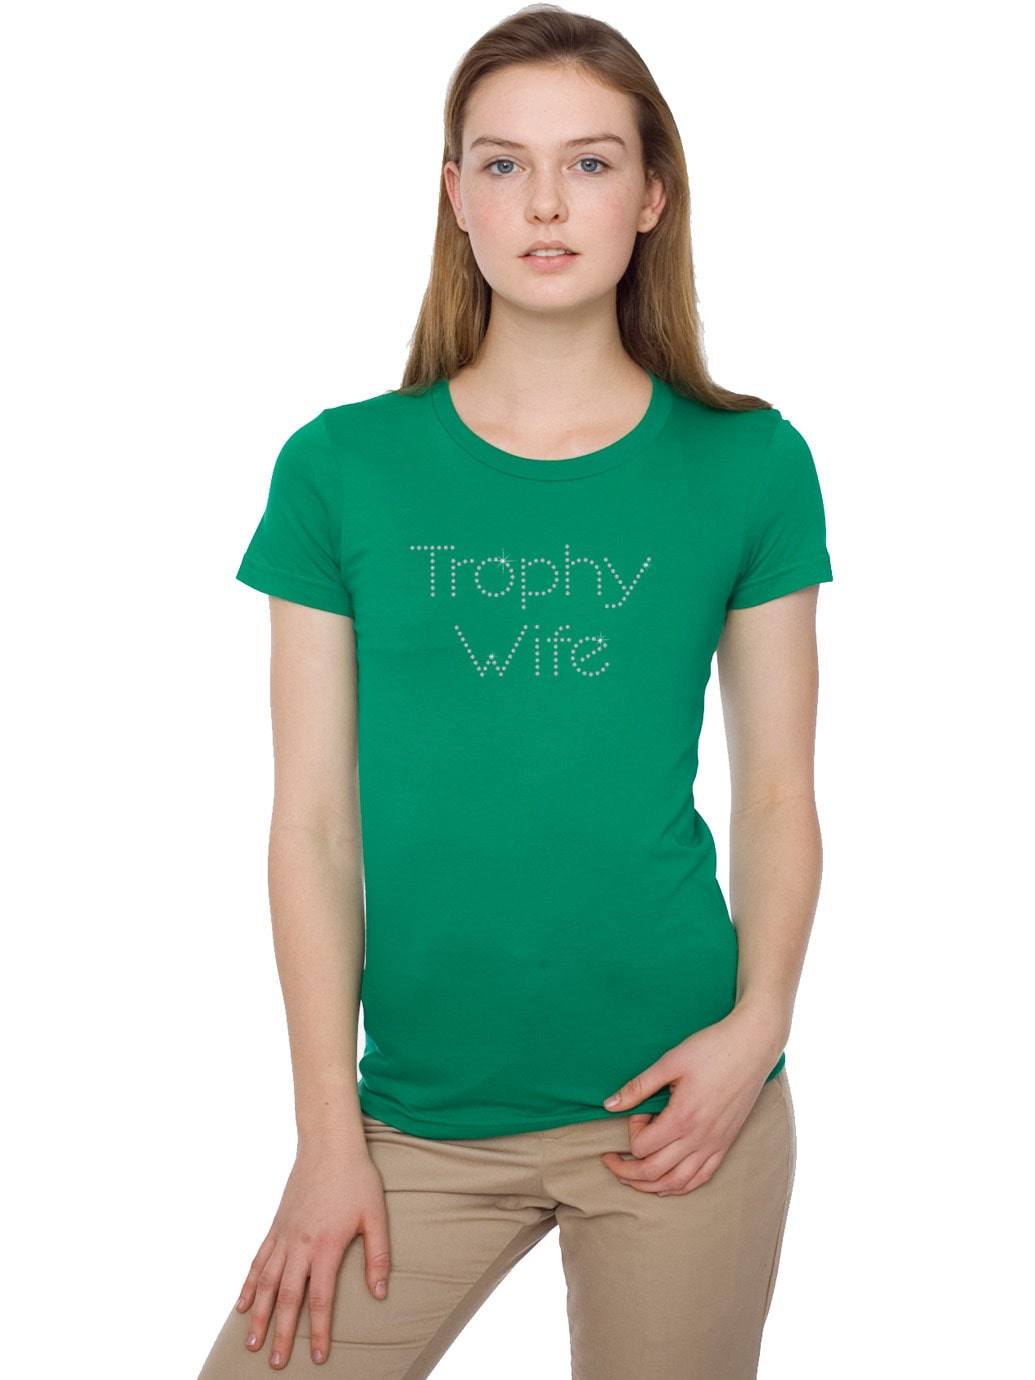 Trophy wife bling t shirt tanktops no minimum rhinestone for T shirt design no minimum